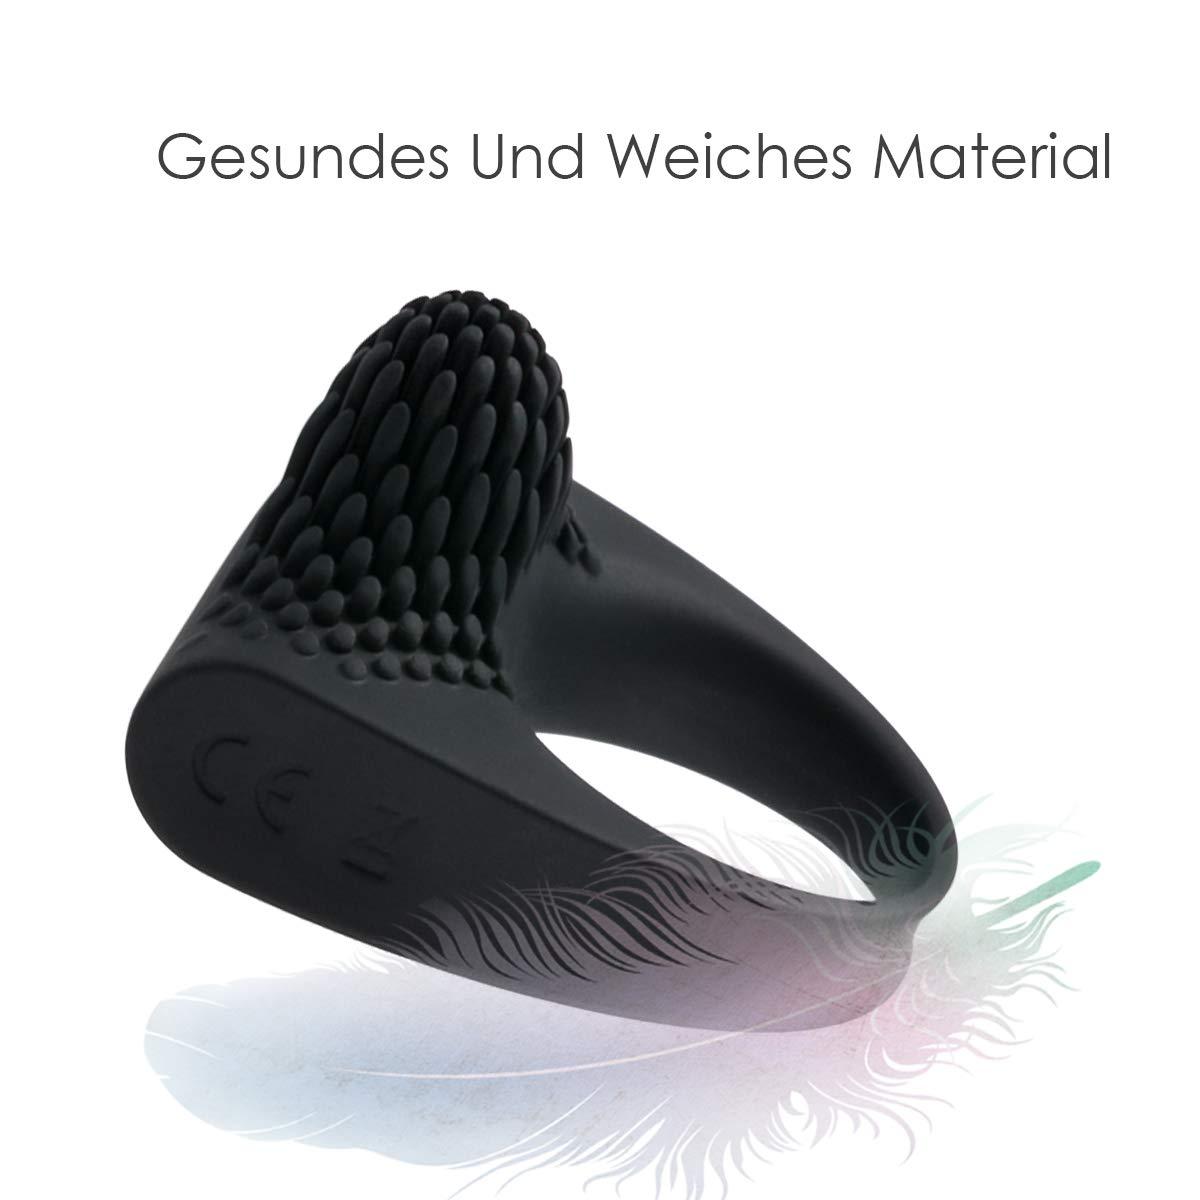 ZEMALIA Silikon-Penisring vibrator Ring sexspielzeug cockring,Perfekt für Paare, Sie und Ihn.